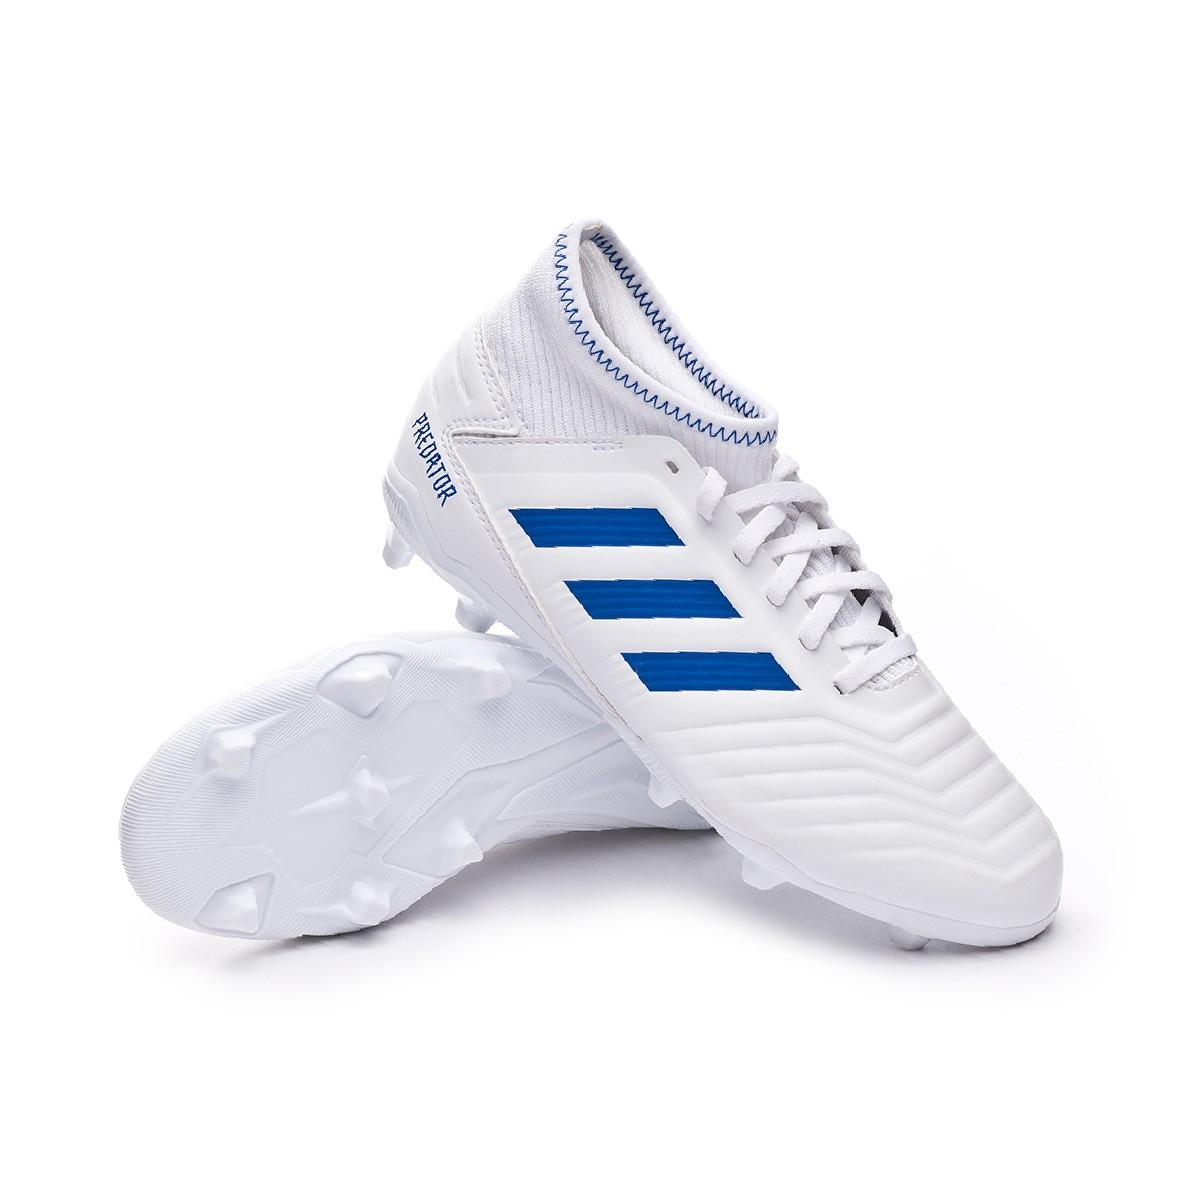 65feaffde265 Football Boots adidas Kids Predator 19.3 FG White-Bold blue - Football  store Fútbol Emotion